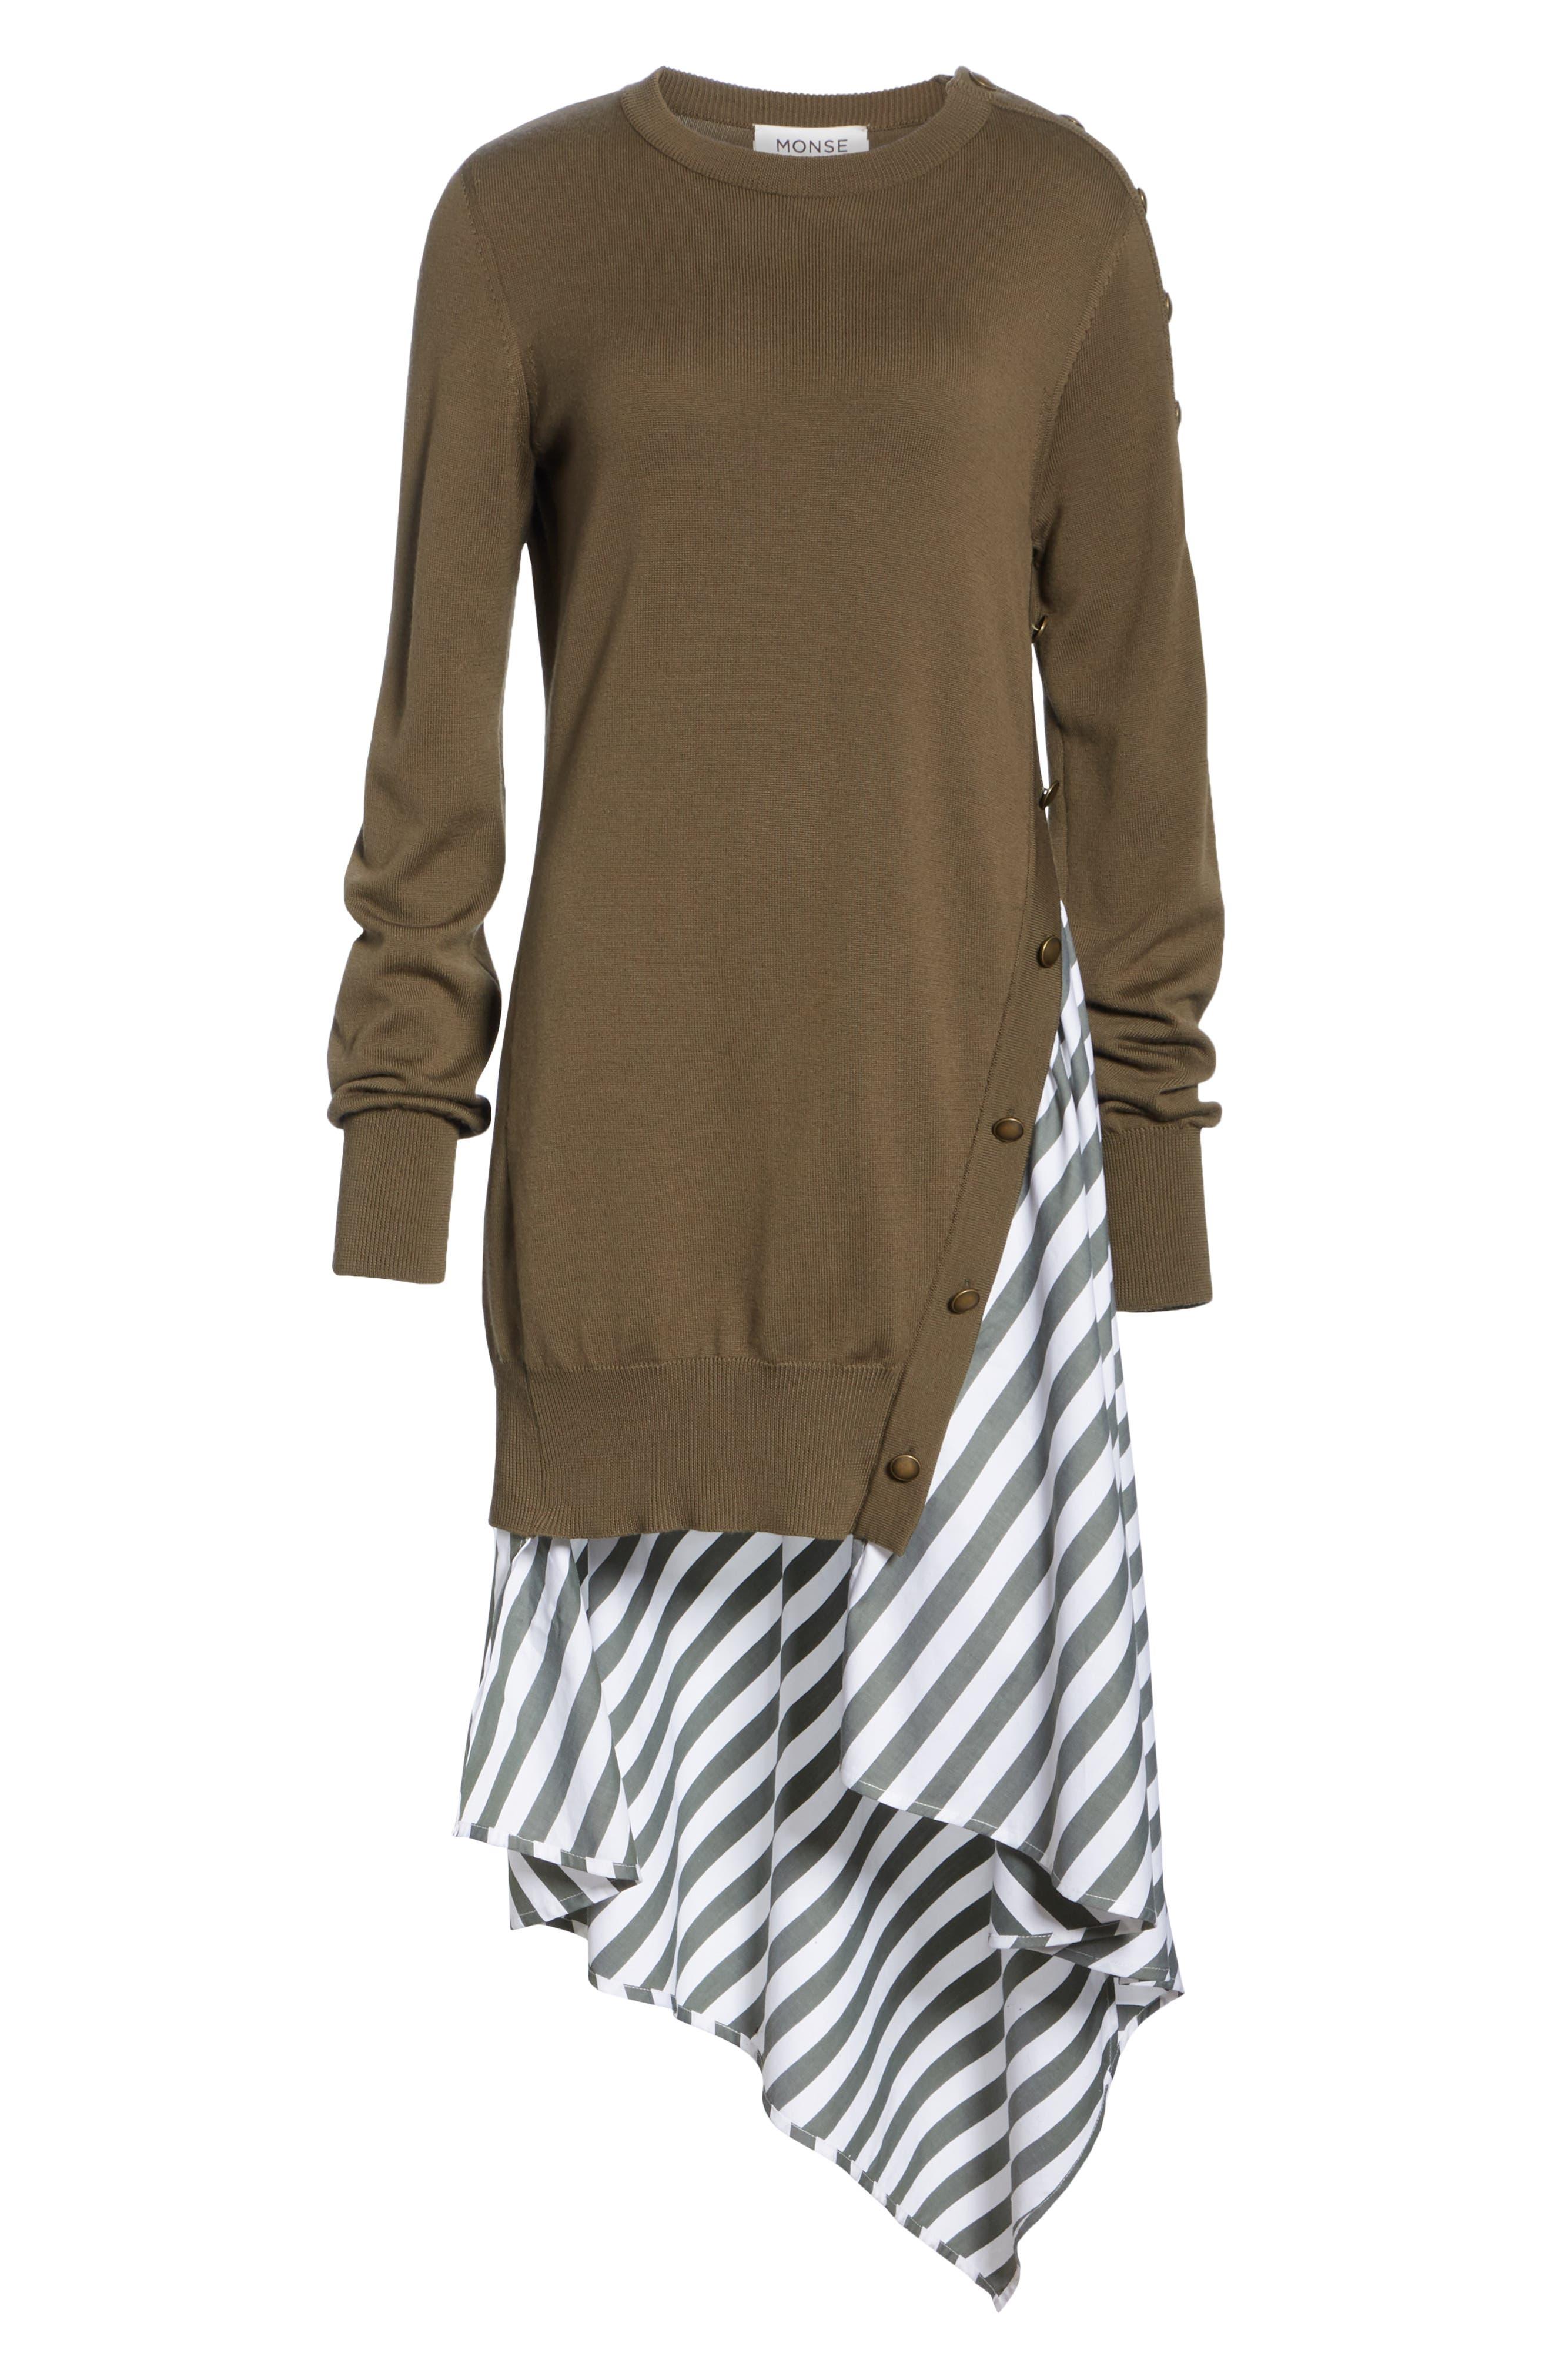 MONSE,                             Knit & Stripe Poplin Asymmetrical Dress,                             Alternate thumbnail 6, color,                             OLIVE/ WHITE